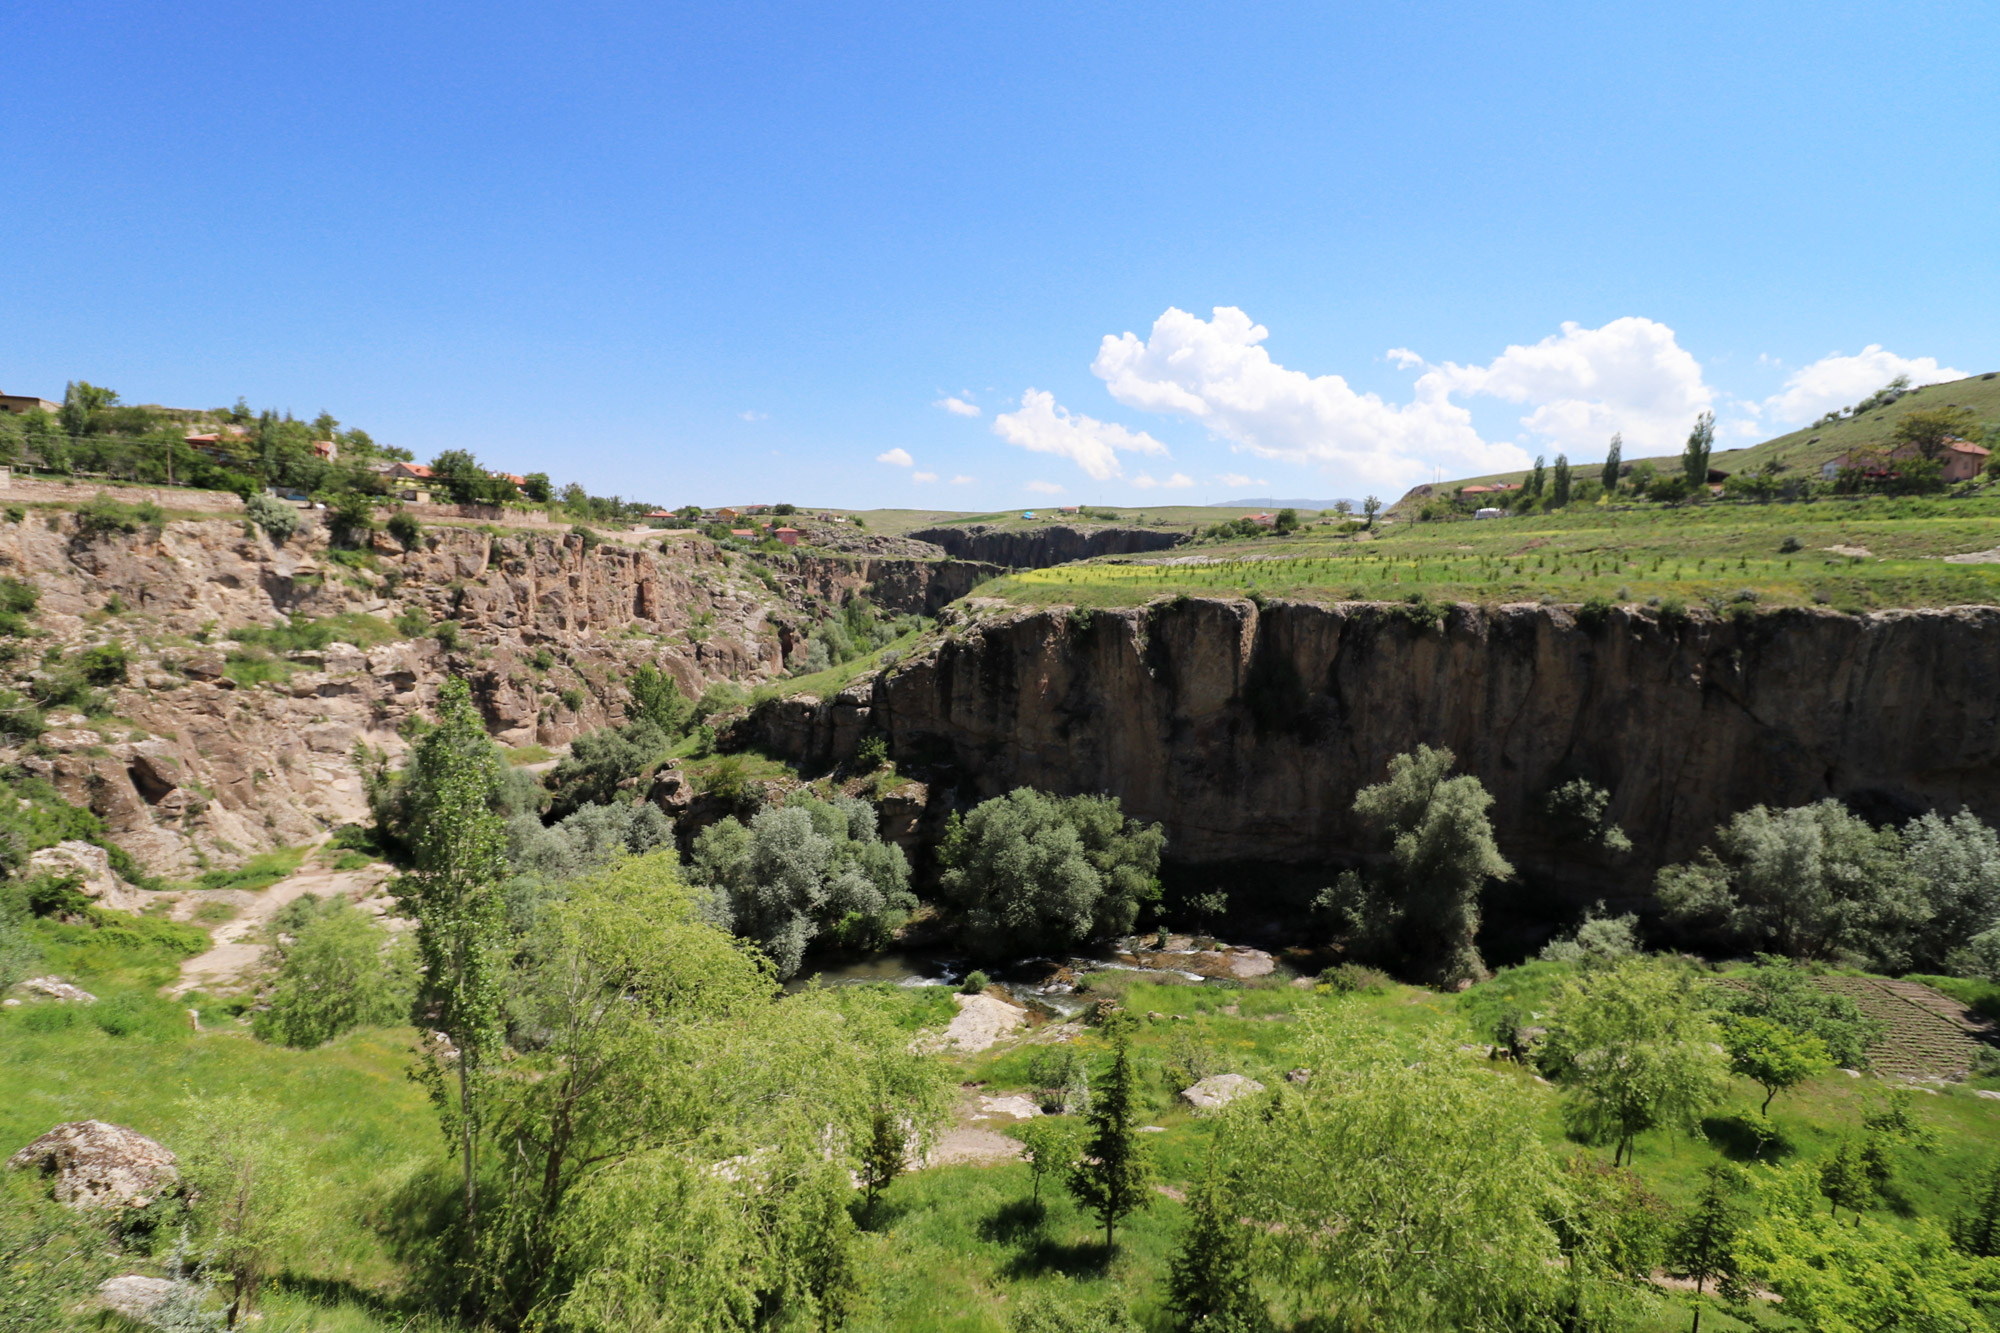 turkije reisverslag laatste dag in cappadocie